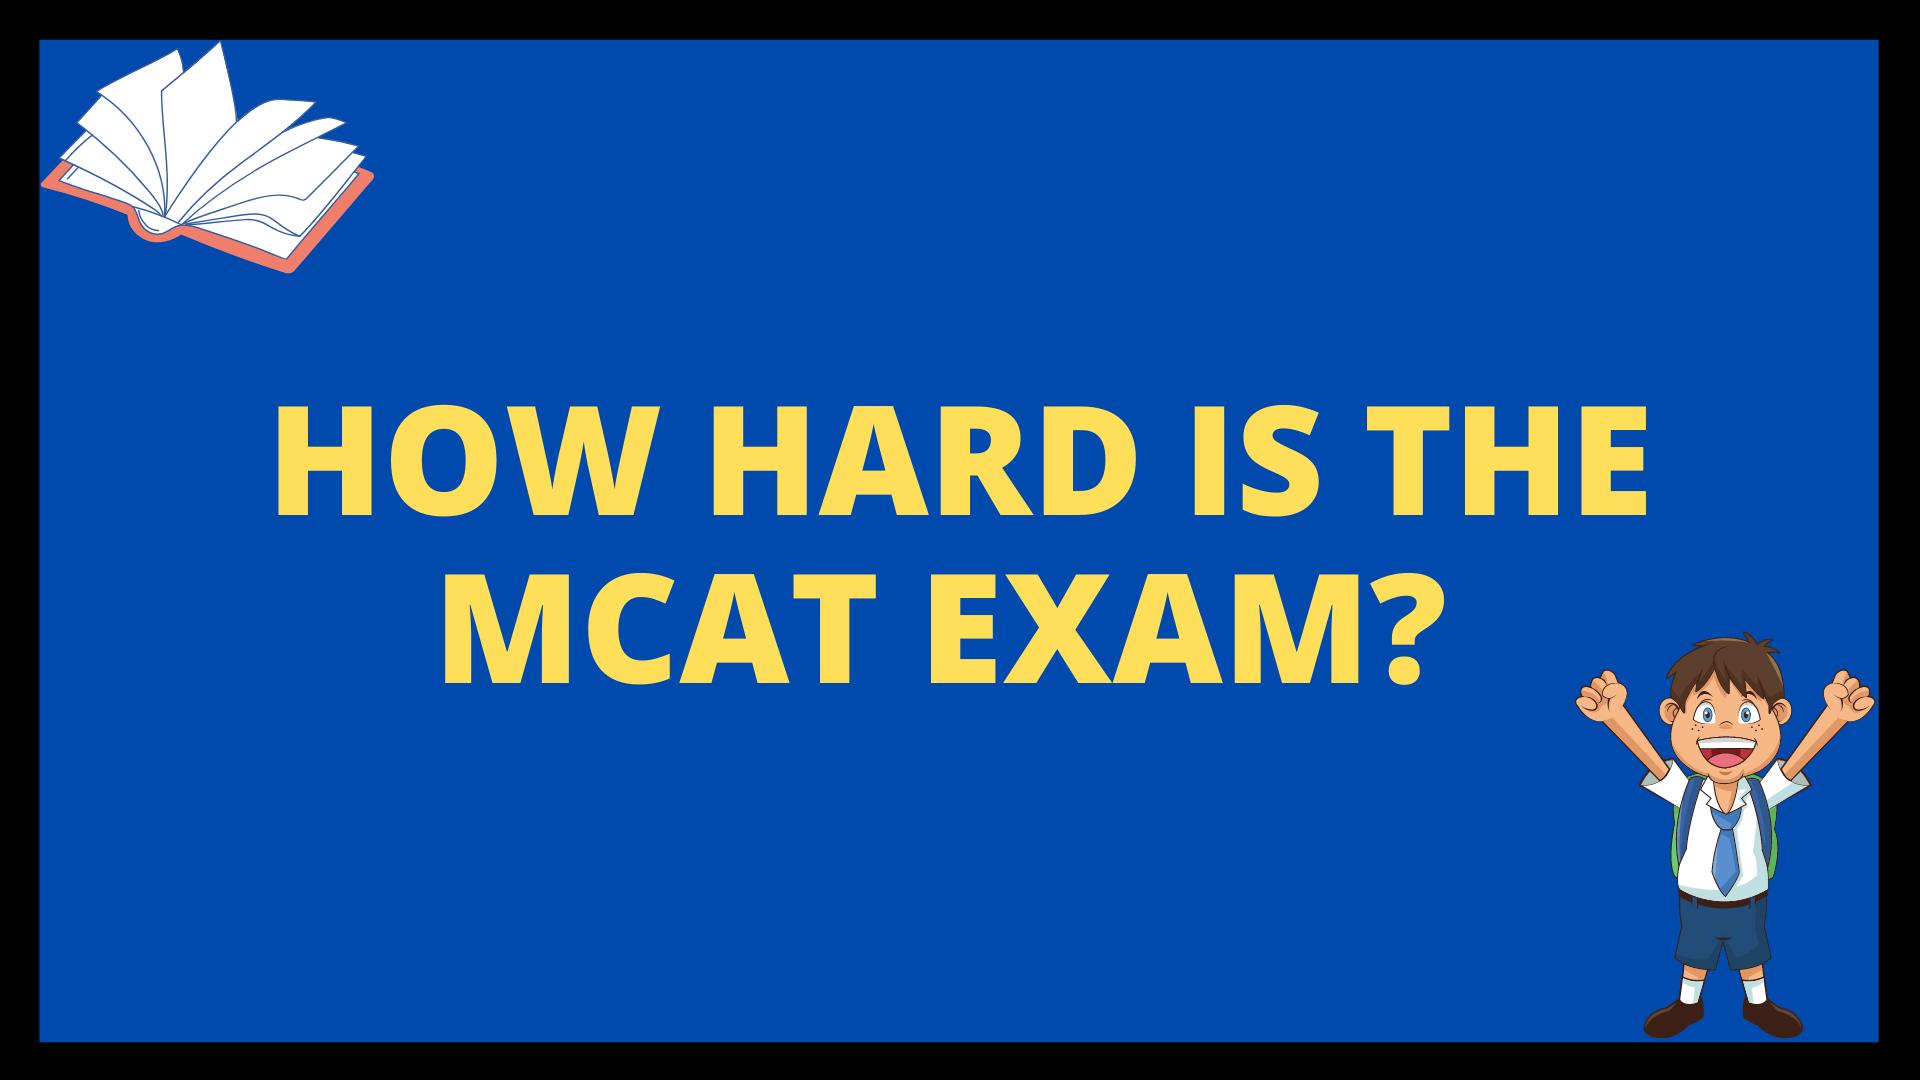 How hard is the MCAT Exam?